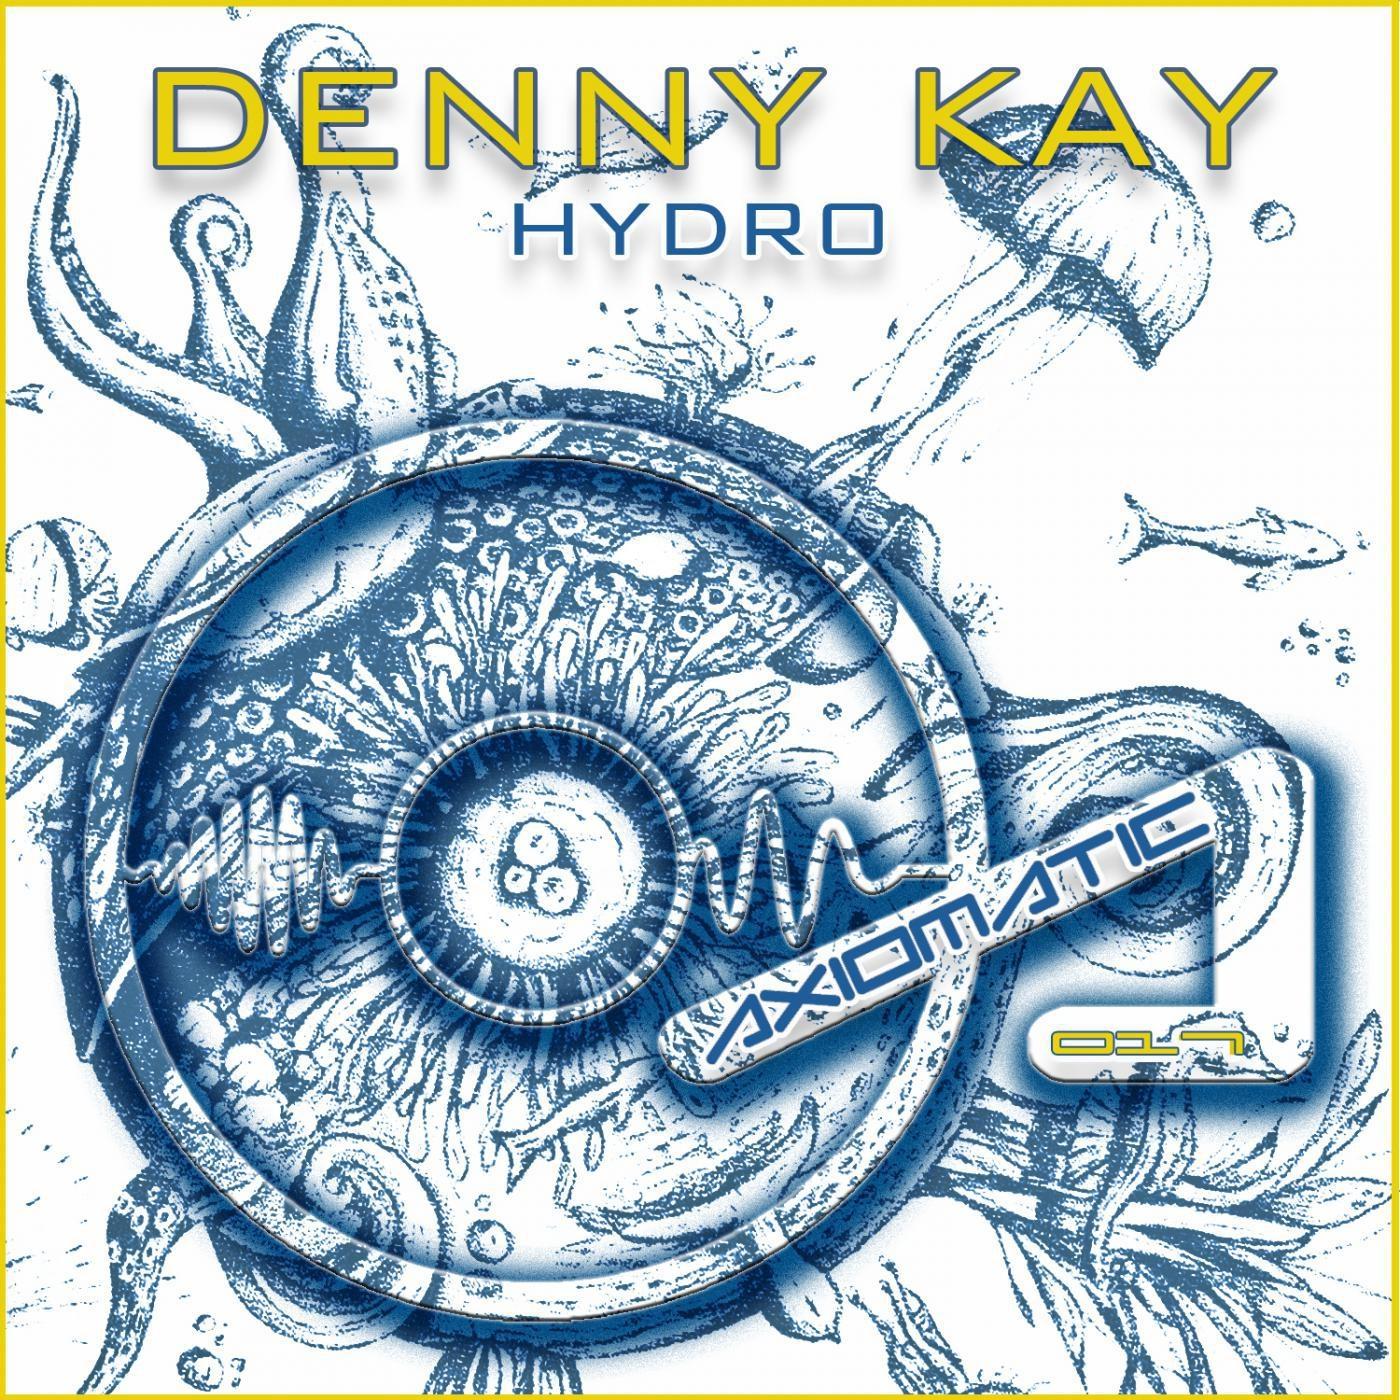 Denny Kay - Hydro (Original Mix)